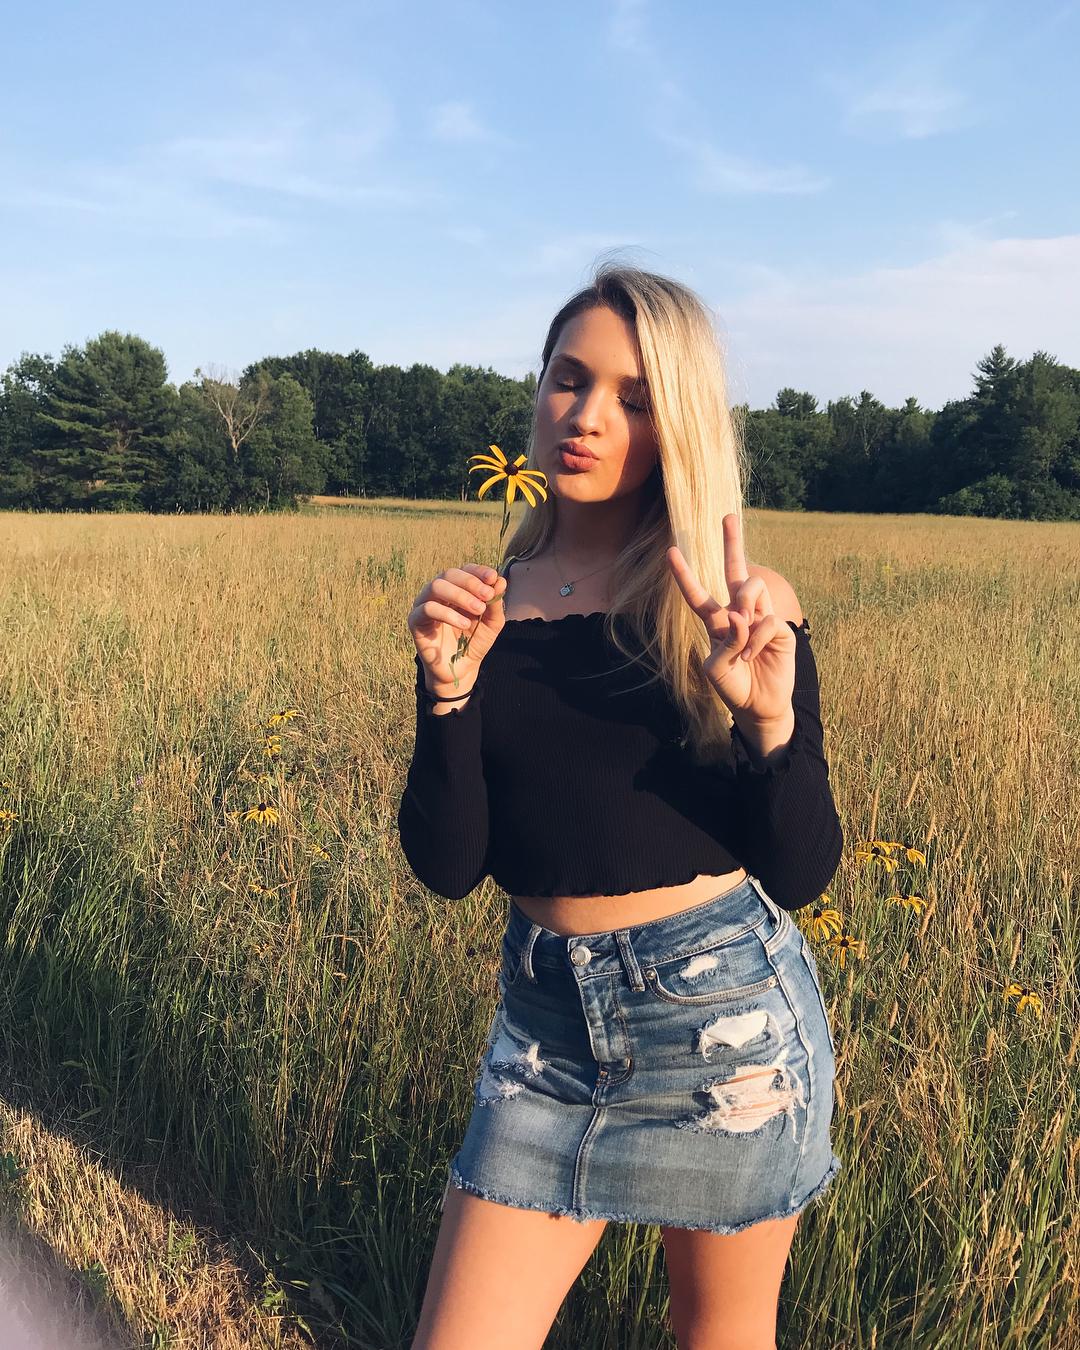 Emily Tressa - Most Beautiful Trans Girl Famous - TG Beauty